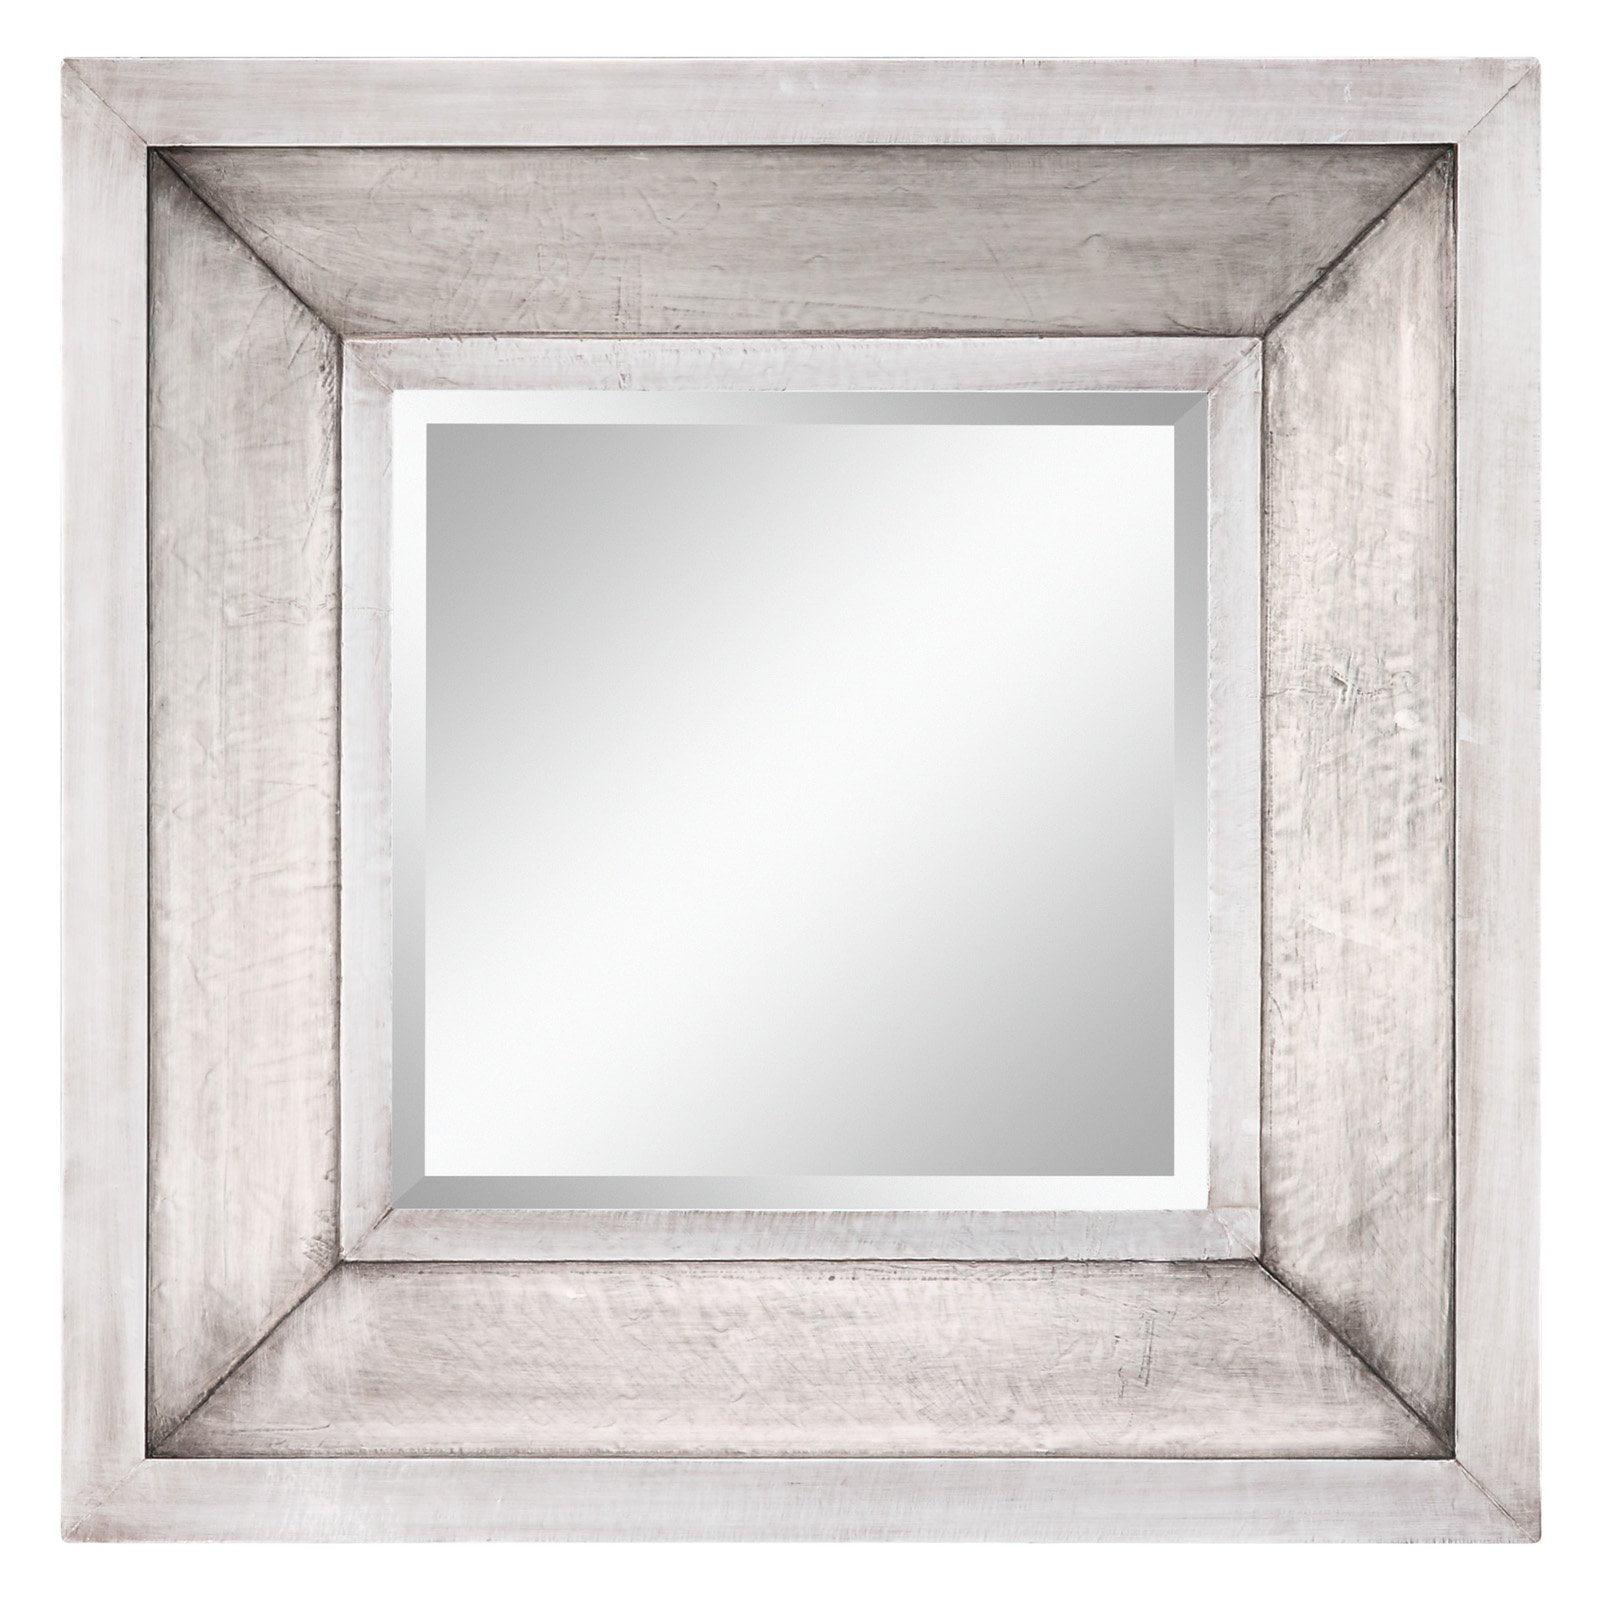 Mirror Tiles - 5x5 mirror tiles